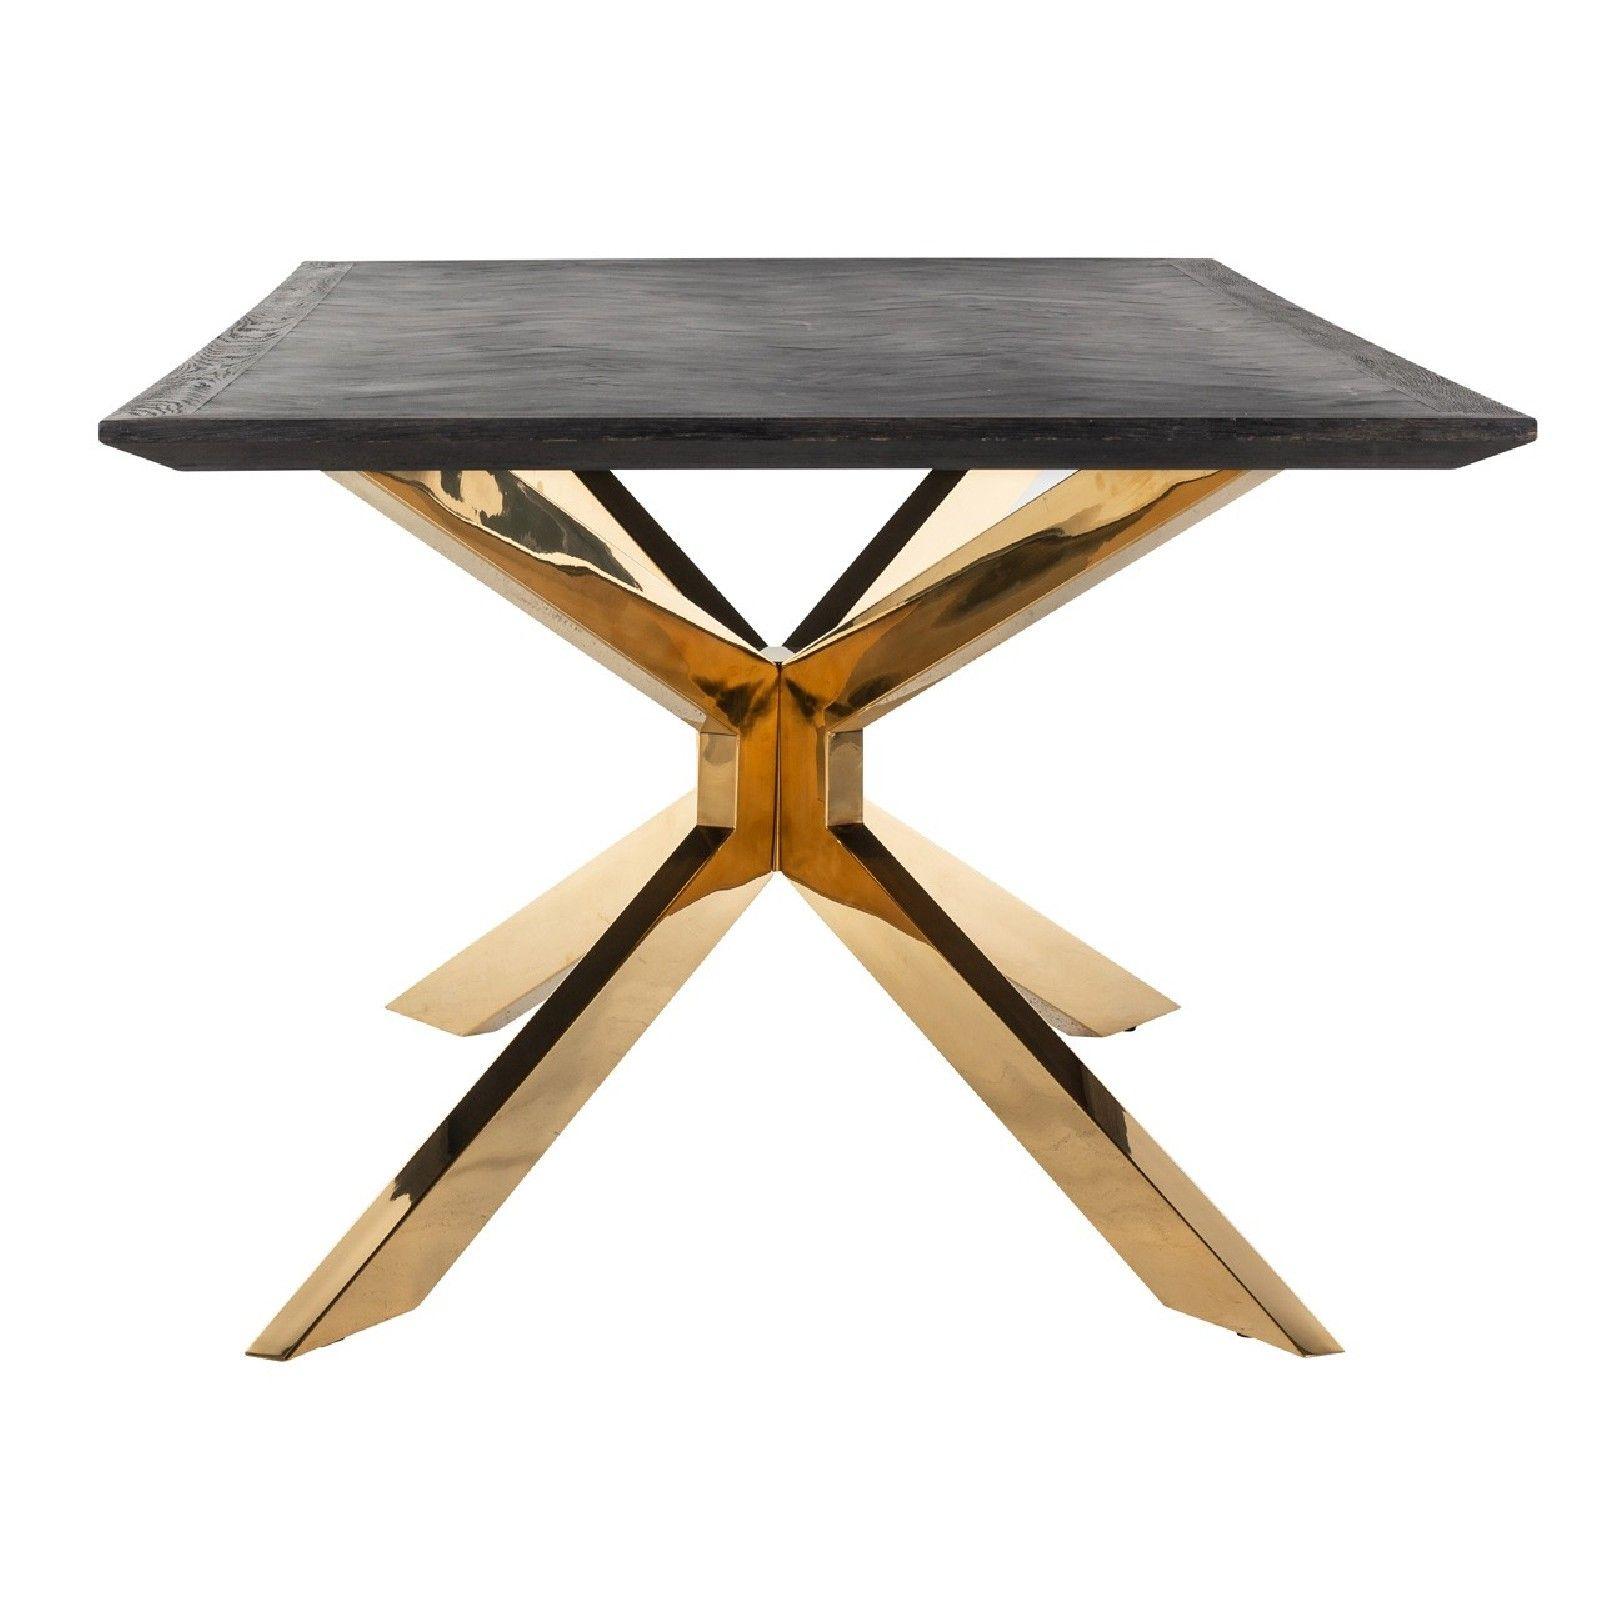 Table à dîner Blackbone Matrix gold 200x100 Meuble Déco Tendance - 369